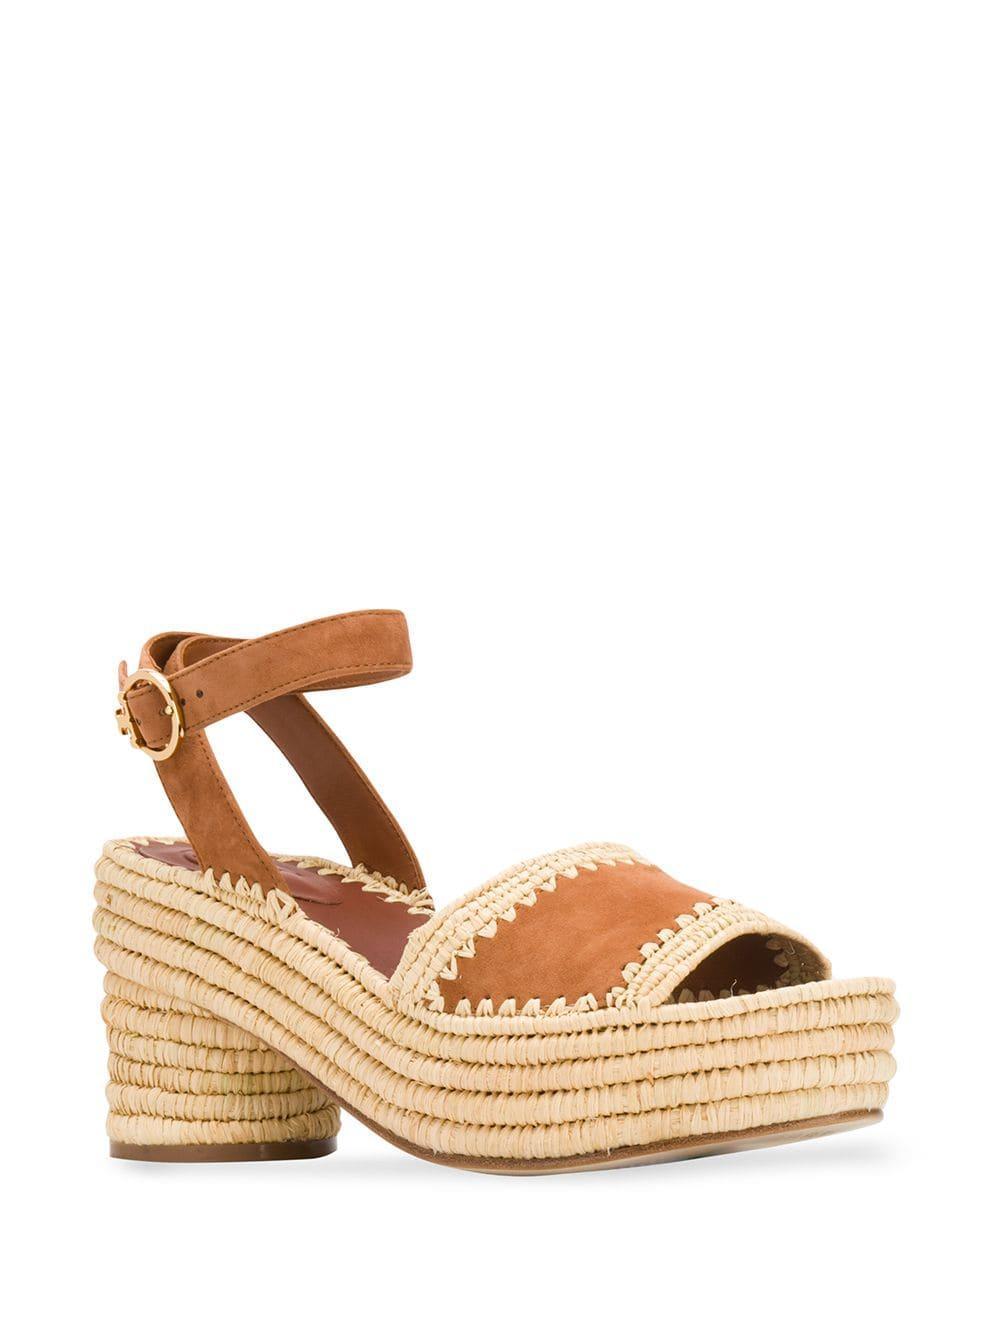 d3642a072387 Lyst - Tory Burch Platform Sandals in Brown